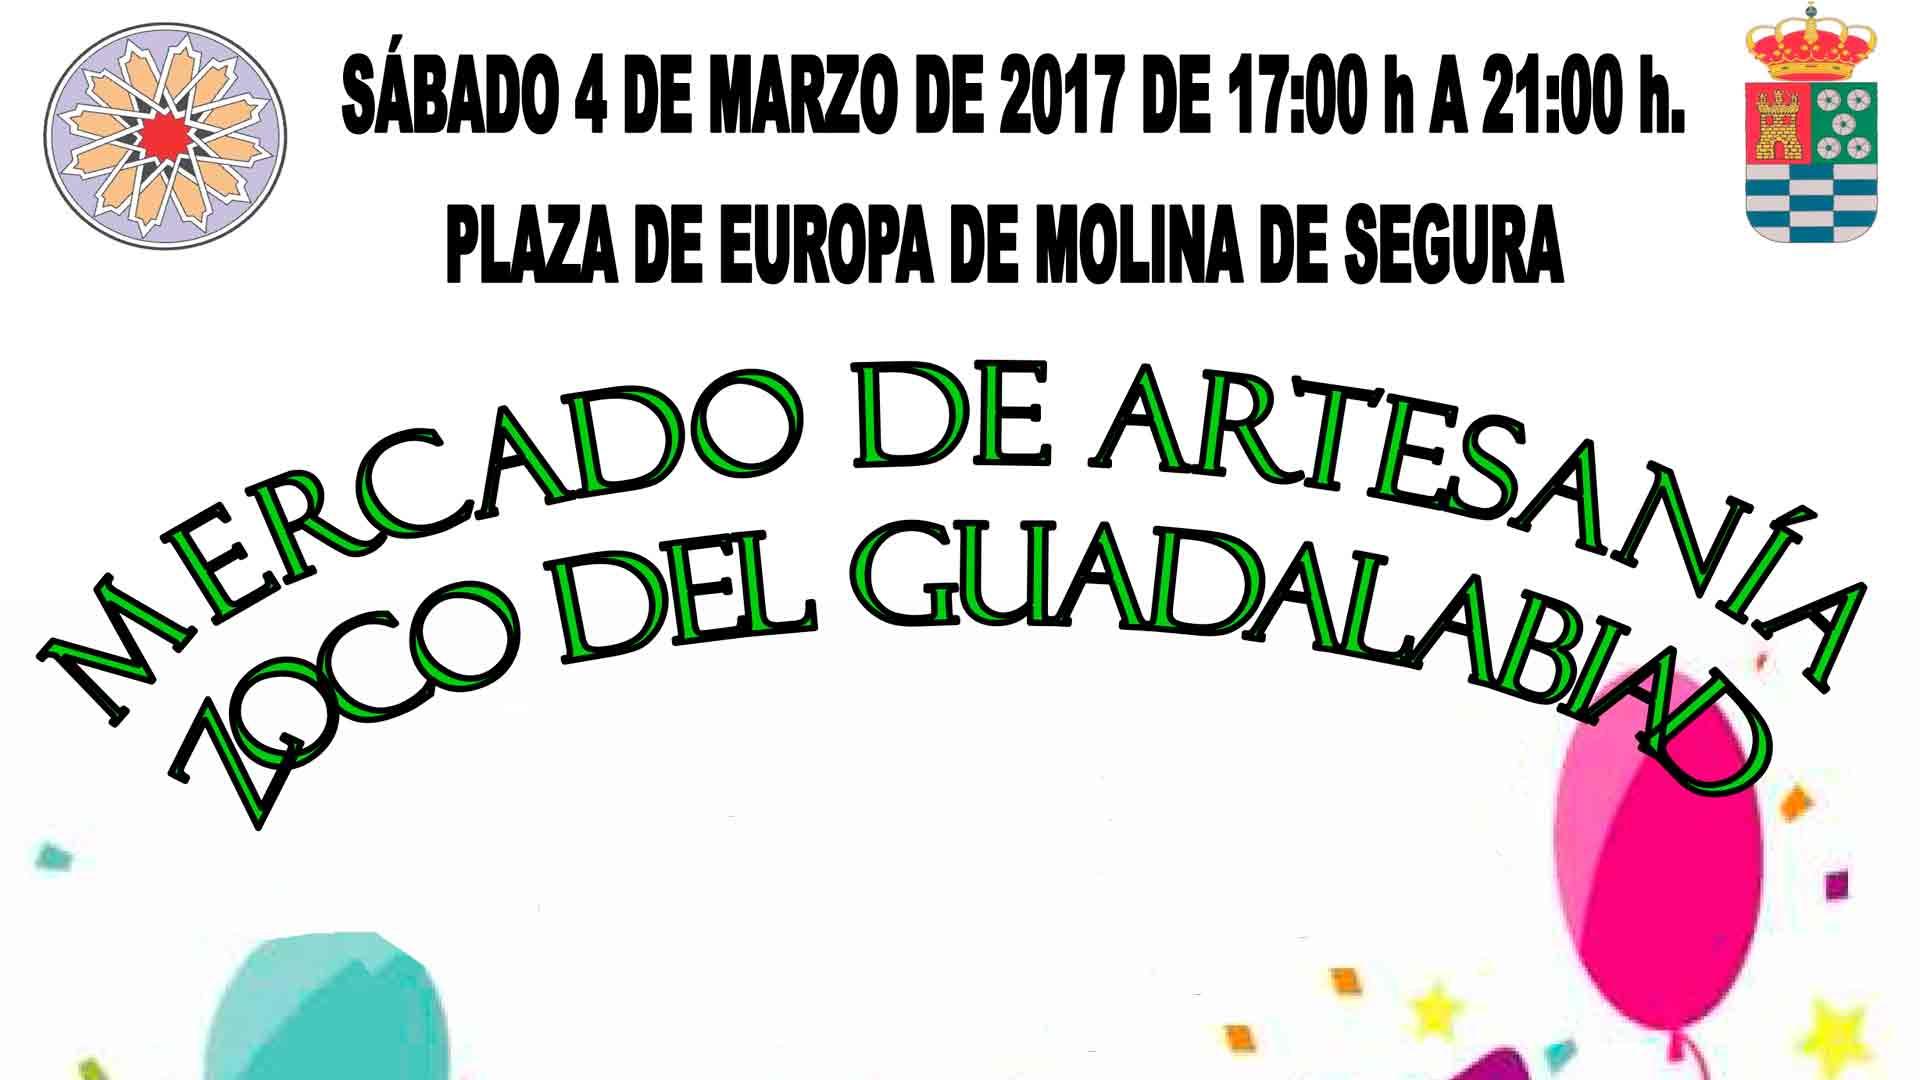 Carnaval-en-Molina-de-Segura